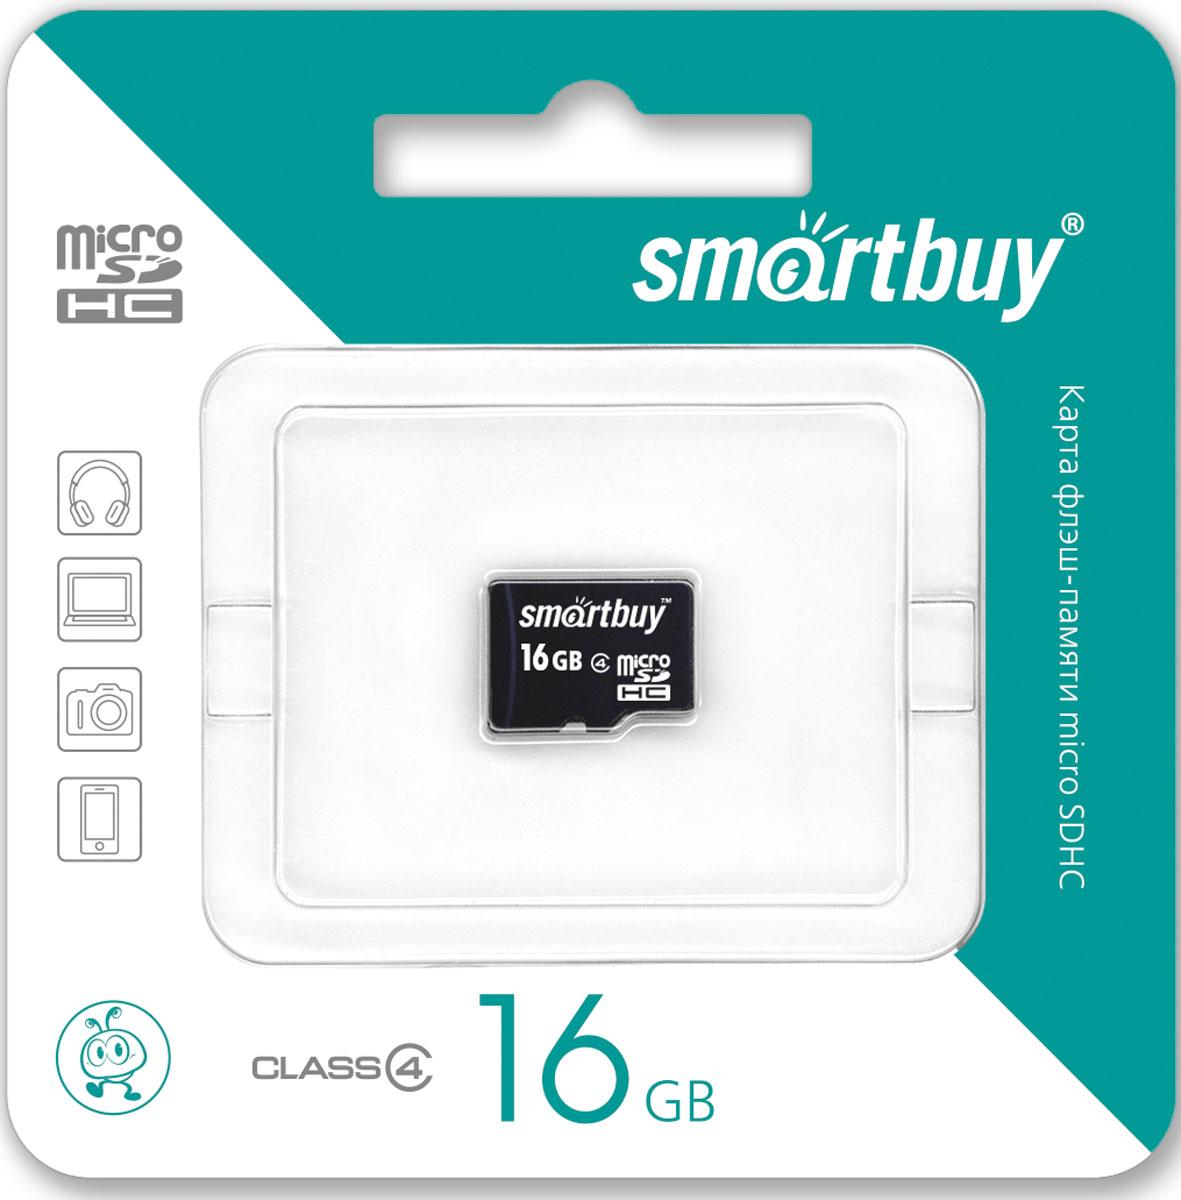 SmartBuy microSDHC Class 4 16GB карта памяти (без адаптера) карта памяти smartbuy microsdhc 16gb class 10 адаптер черный